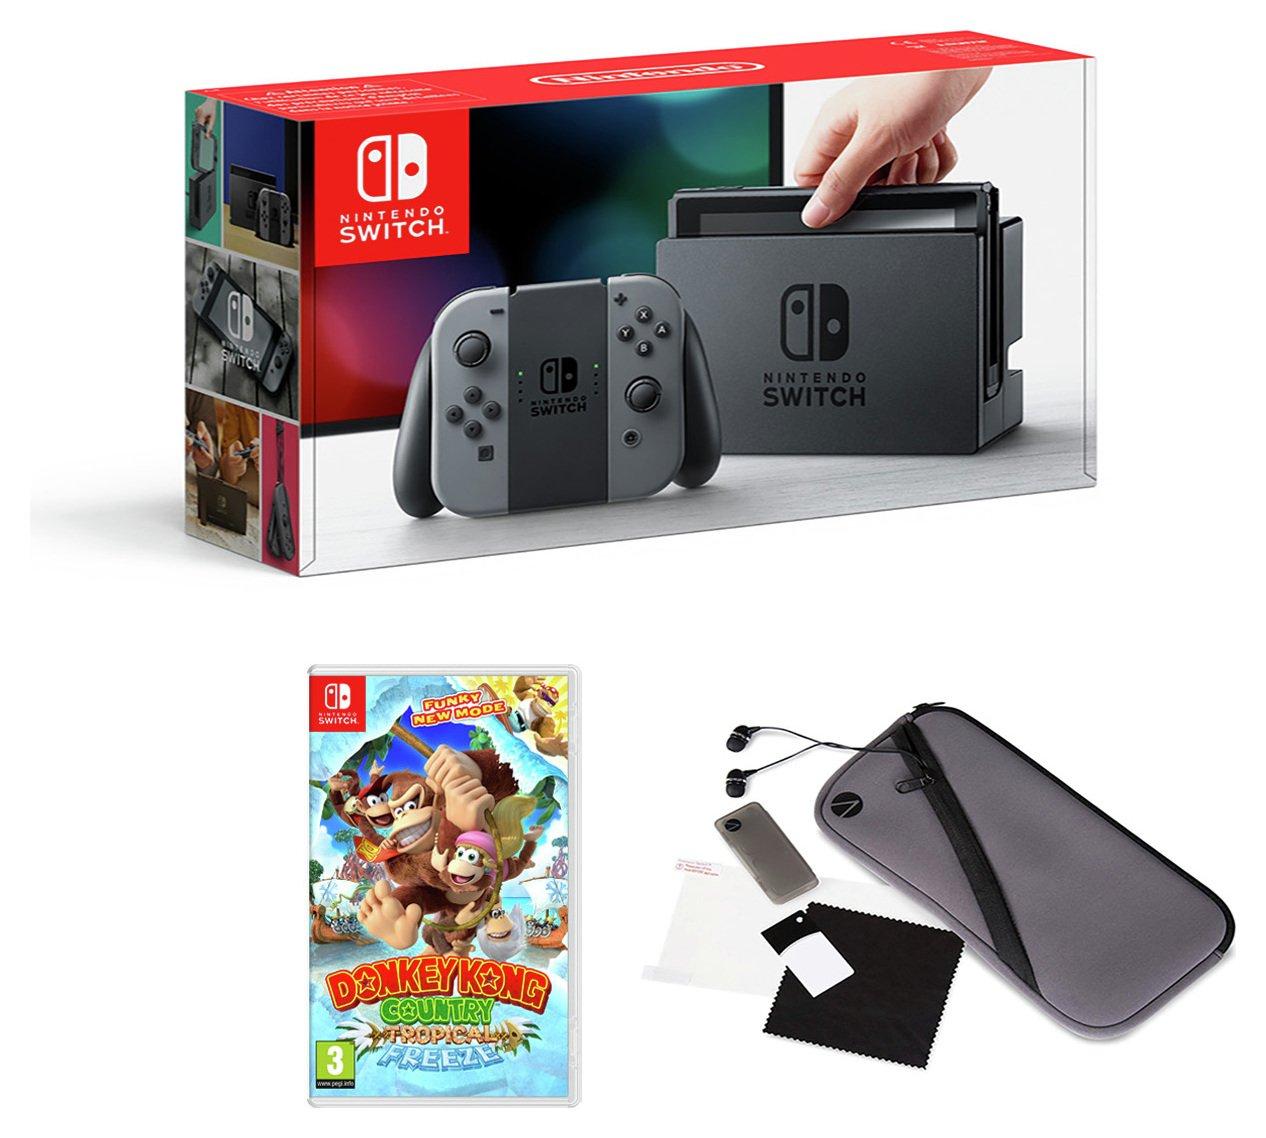 Image of Nintendo Switch Console Grey w/ Donkey Kong & Accessory Pack